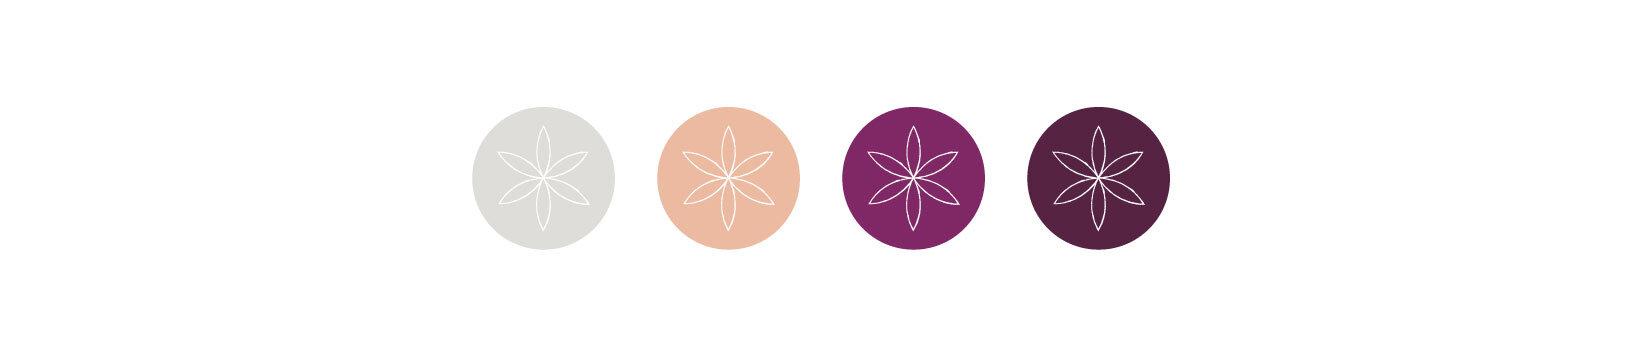 Marie Tennant - Intuitive Brand Design